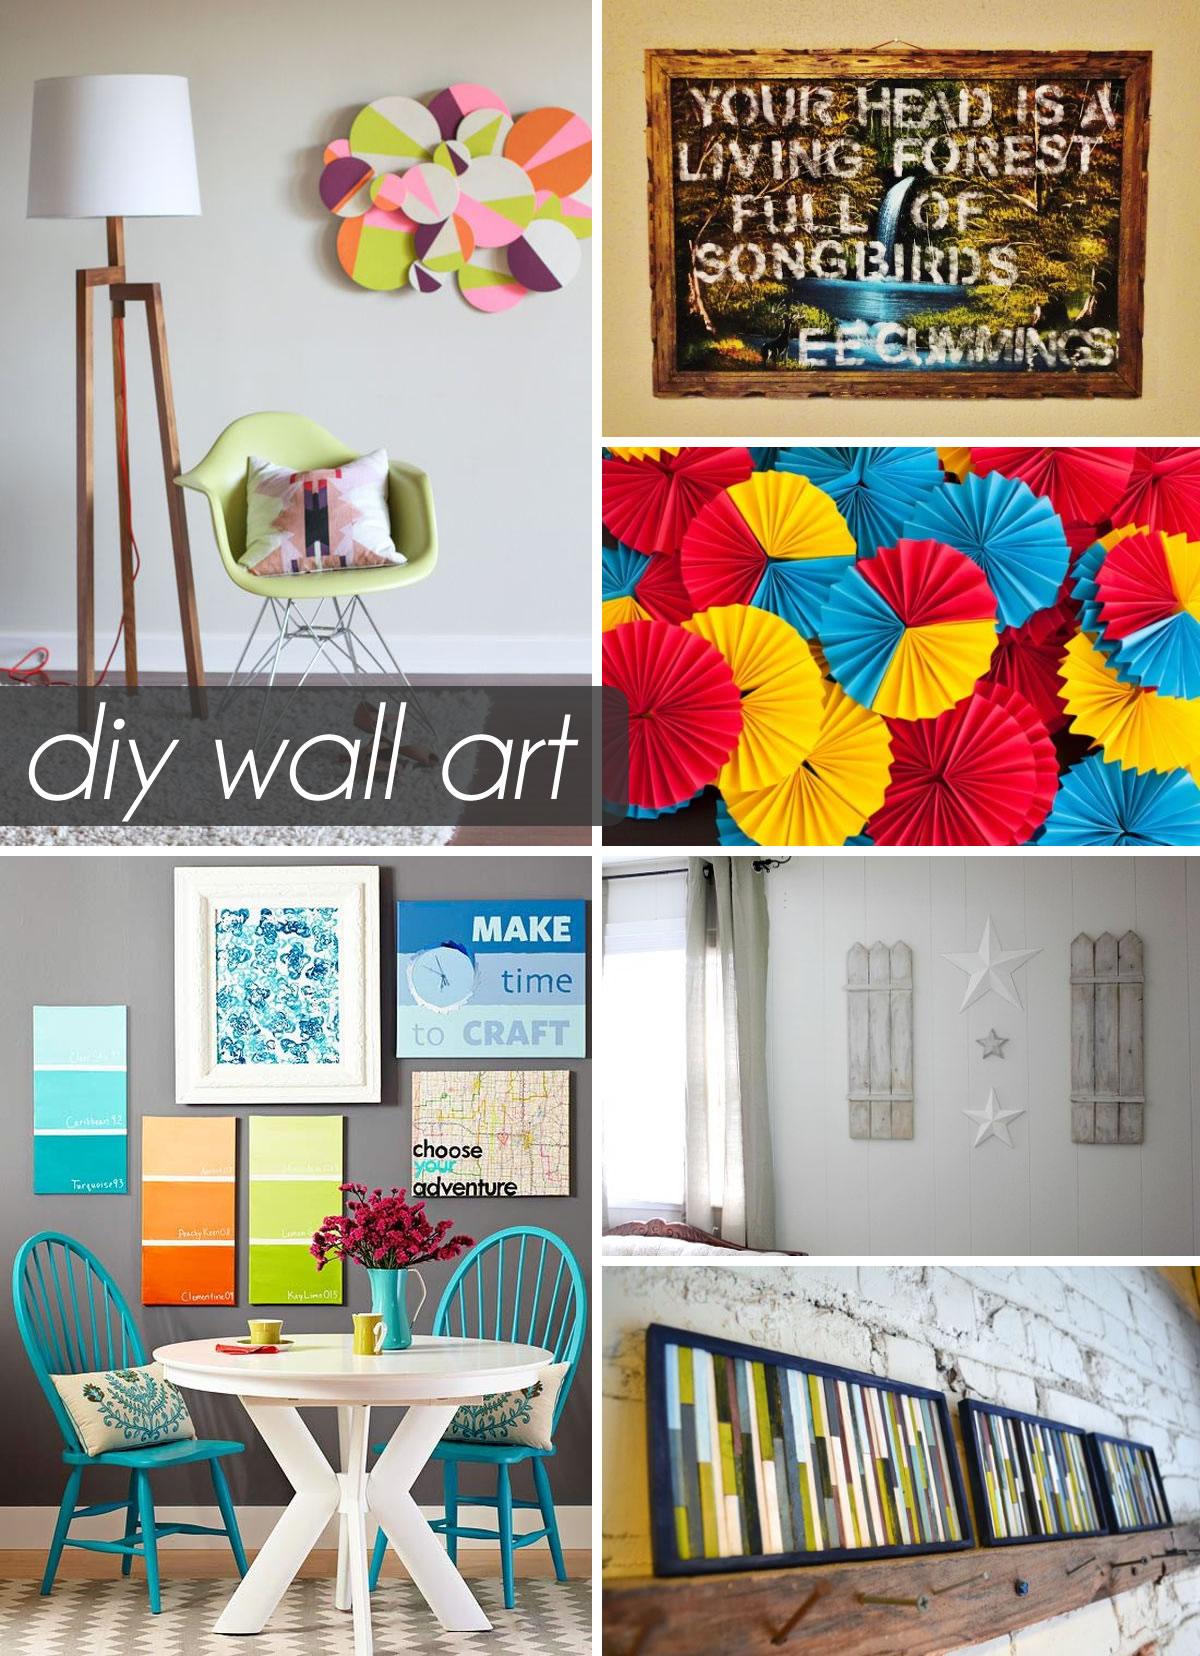 Marvellous Home Decor Cheap Ideas Your Home Craft Ideas Diy Wall Art Ideas Home Decor home decor Creative Ideas For Home Decor